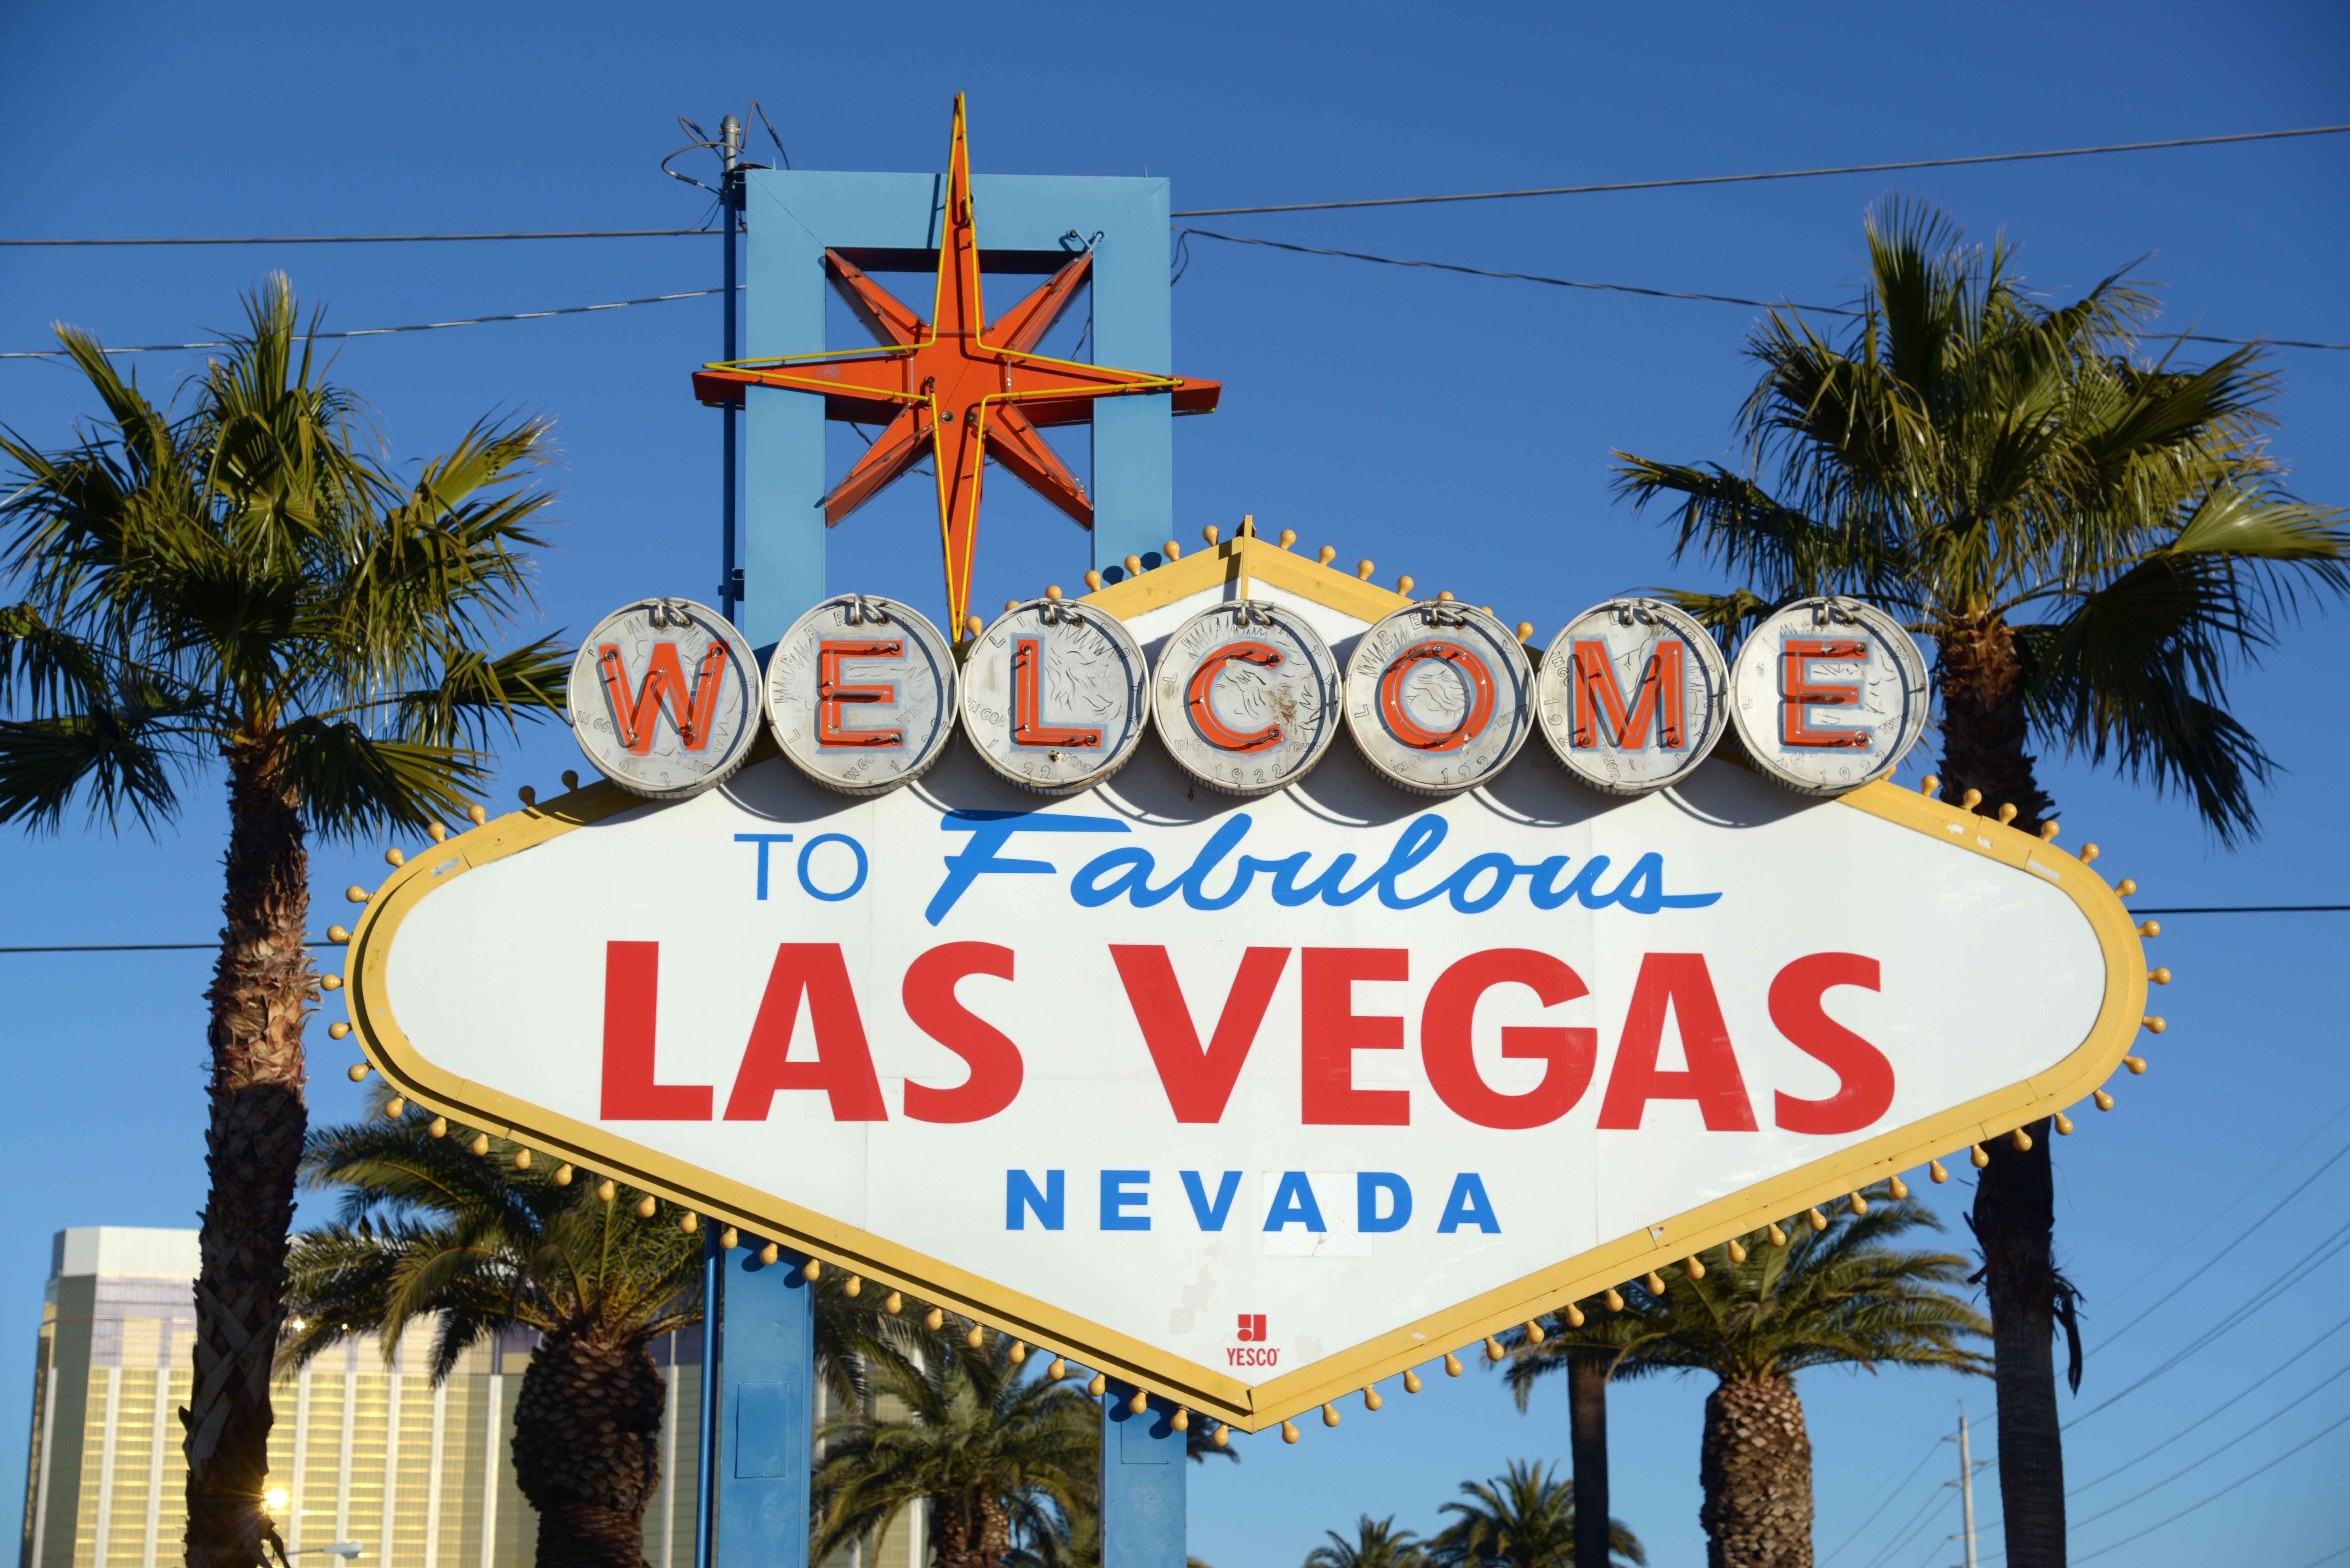 The Utes are in fabulous Las Vegas for the Royal Purple Las Vegas Bowl.